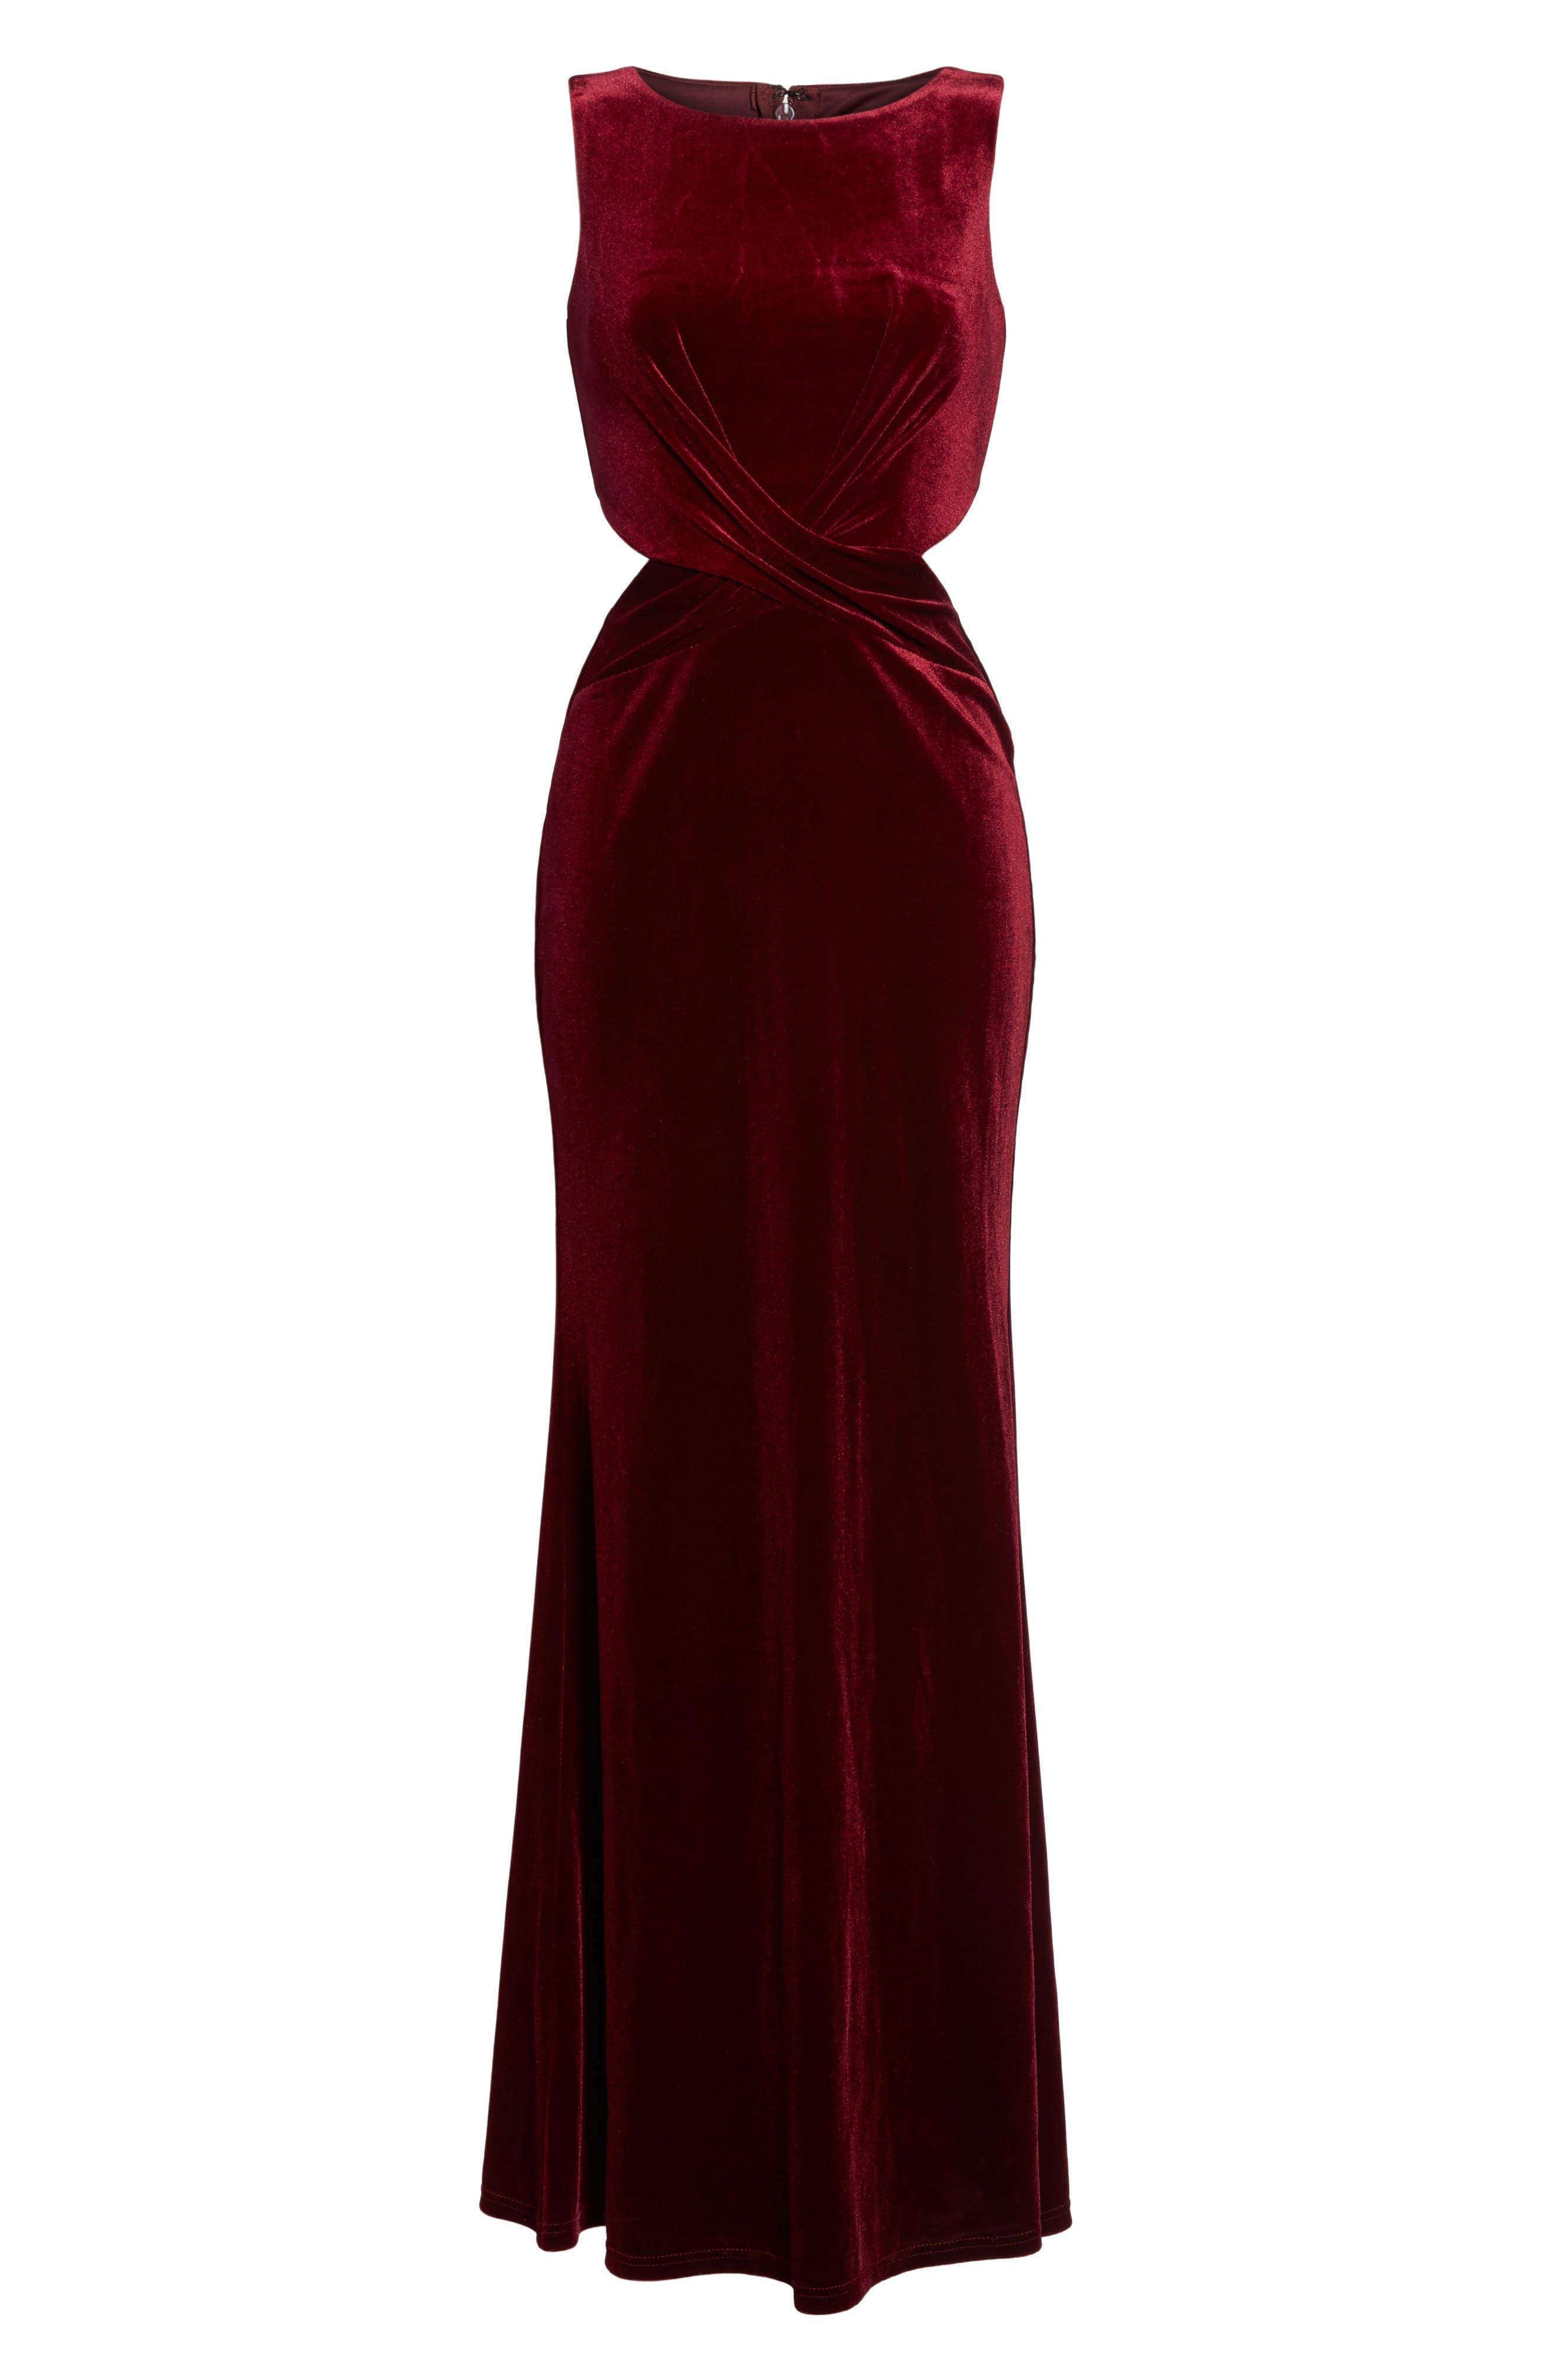 Reach Out Velvet Maxi Dress,                             Alternate thumbnail 6, color,                             Burgundy